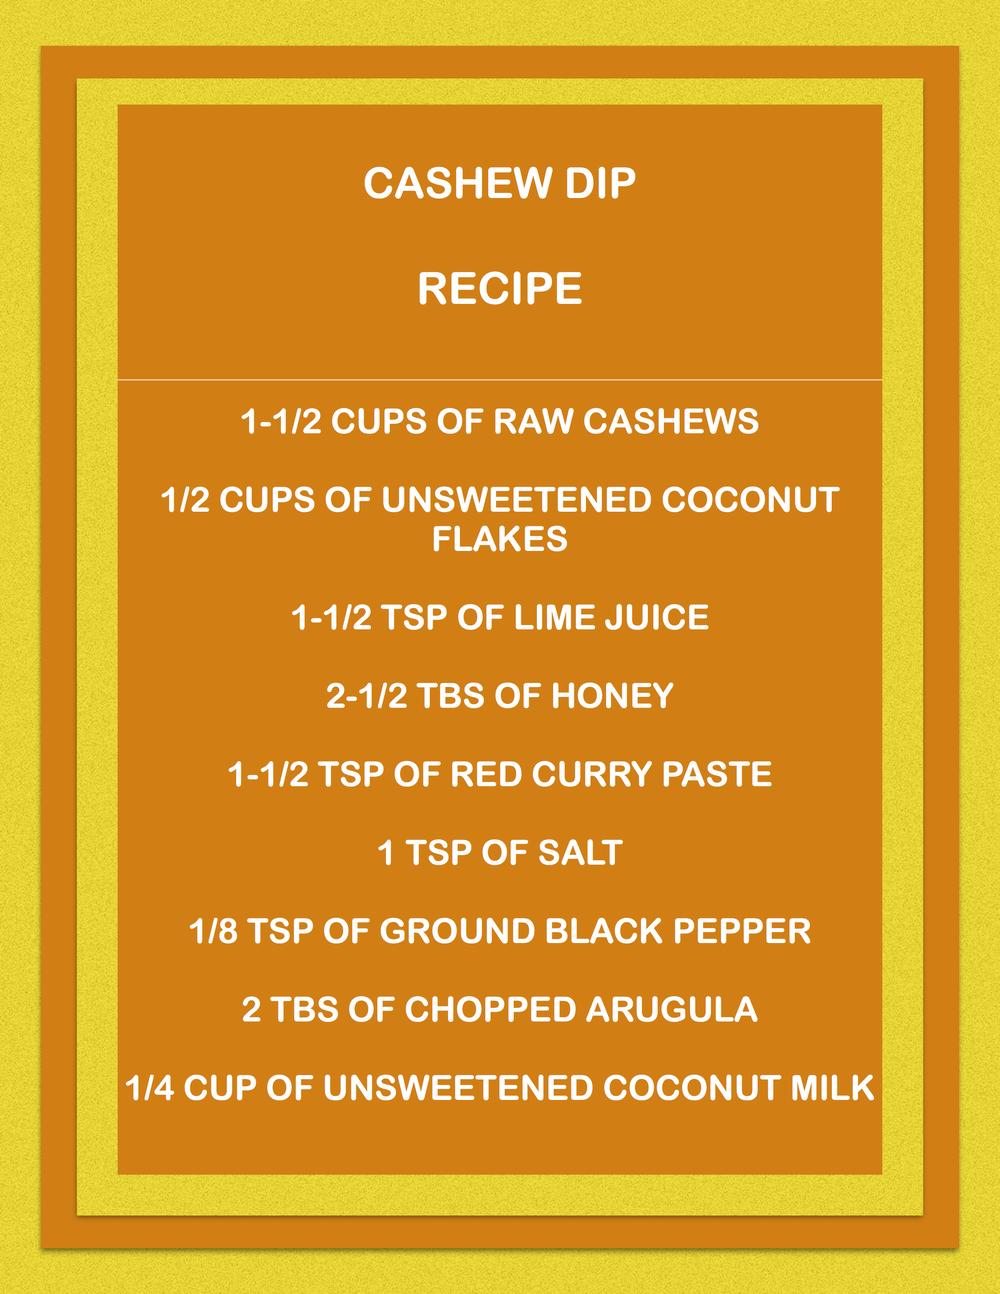 CASHEW DIP RECIPE.png